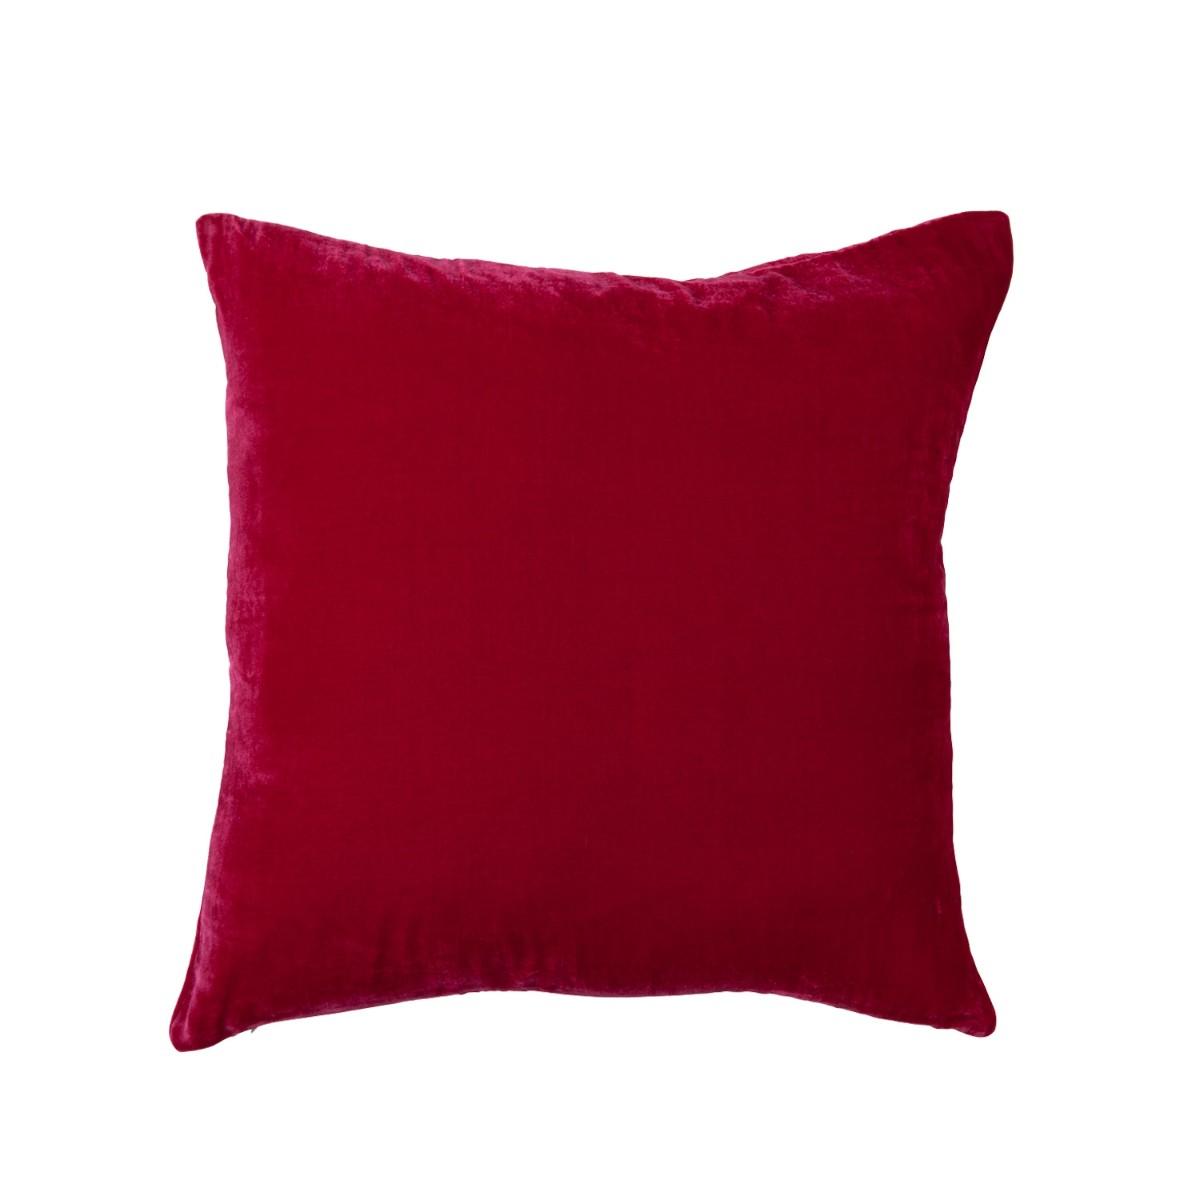 William Yeoward |Paddy Velvet Cushion Raspberry